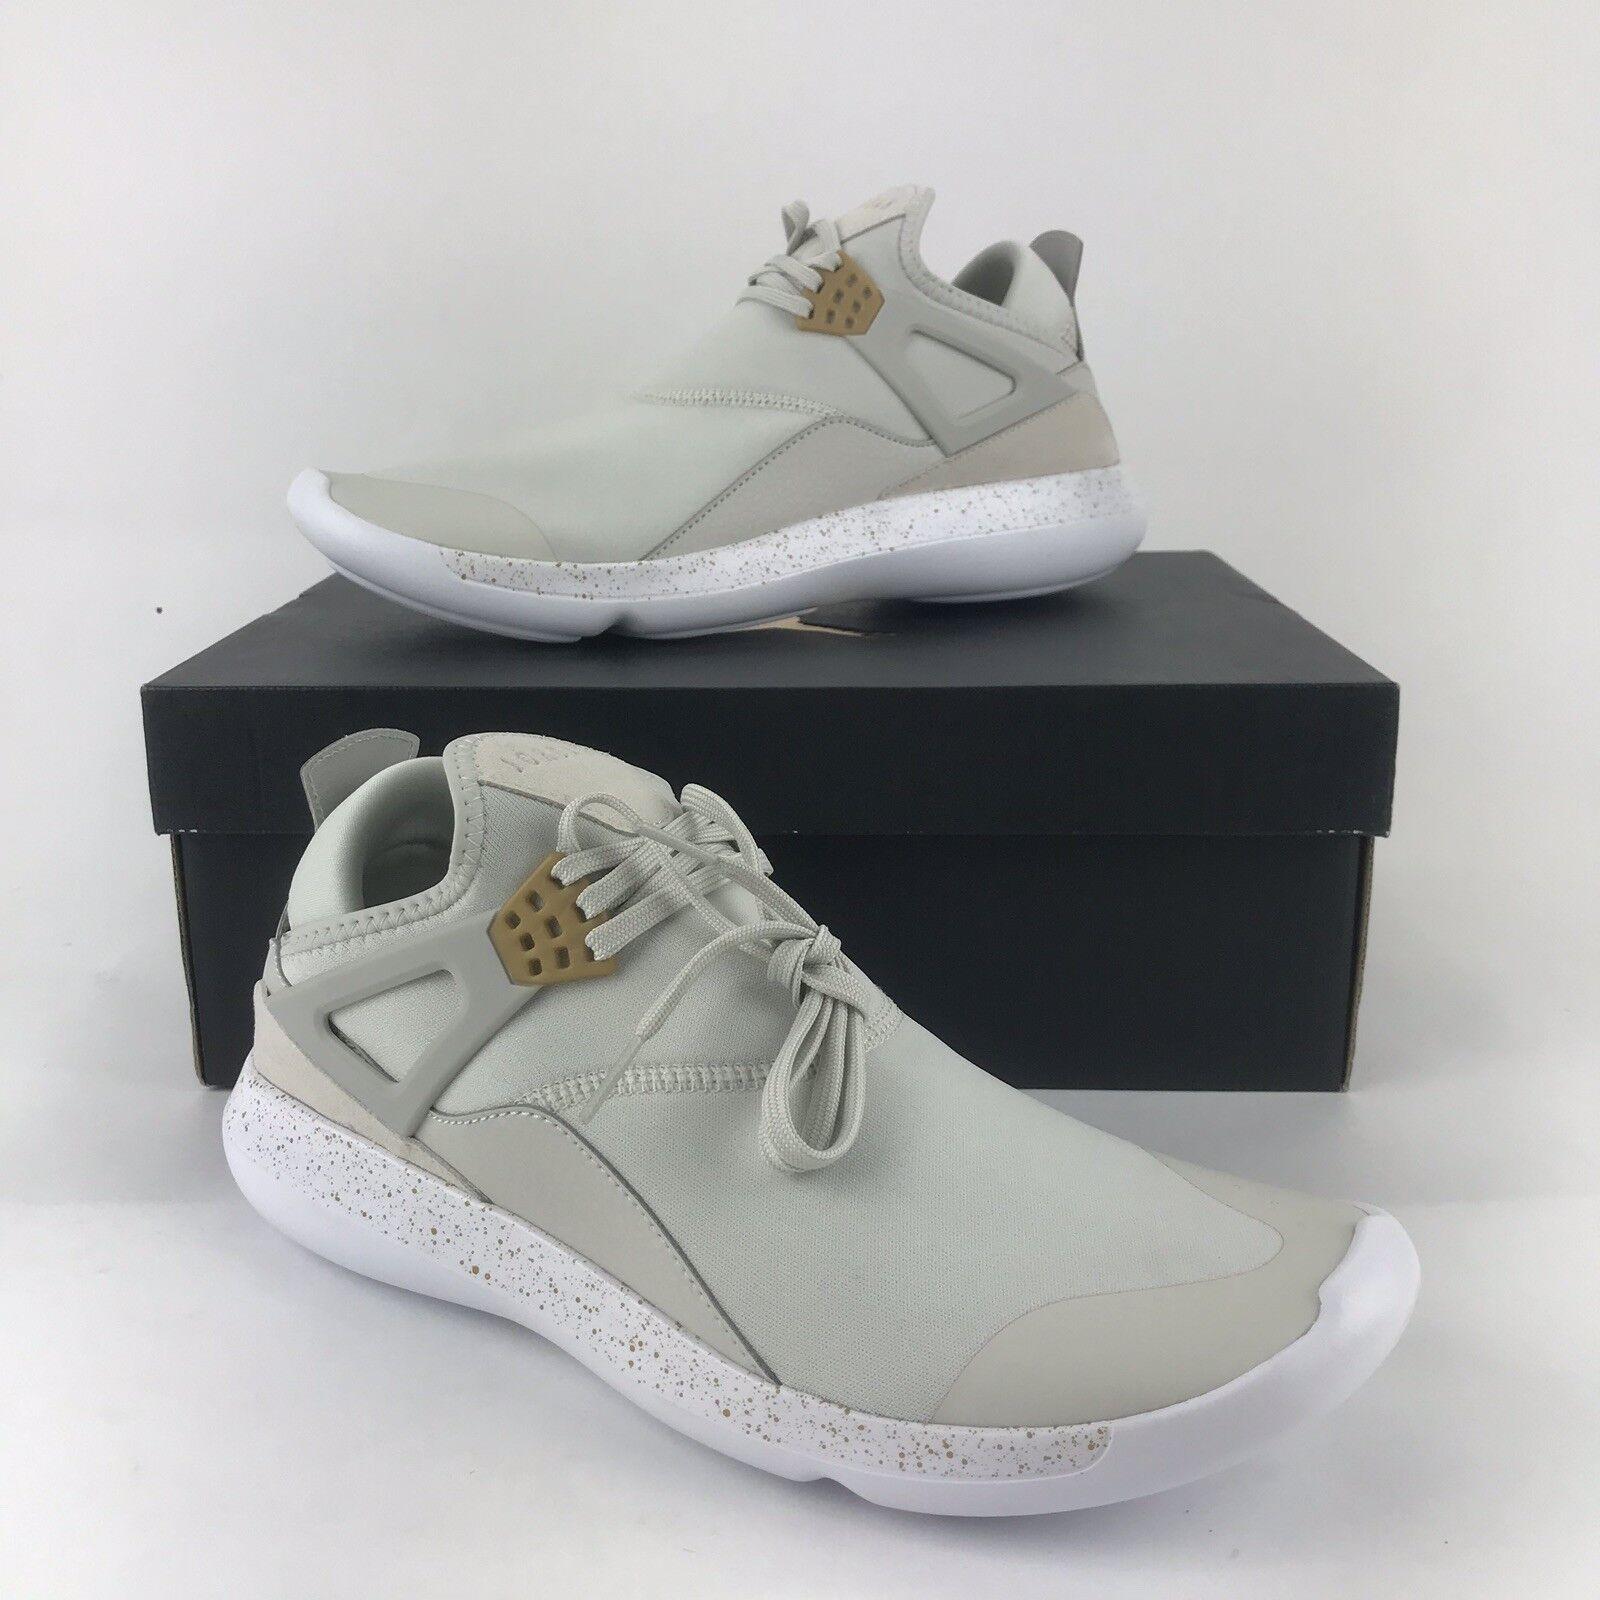 bc2e1d01033d Nike Jordan Fly  89 Light Bone Metallic Metallic Metallic gold NIB Size US  9.5 Men s